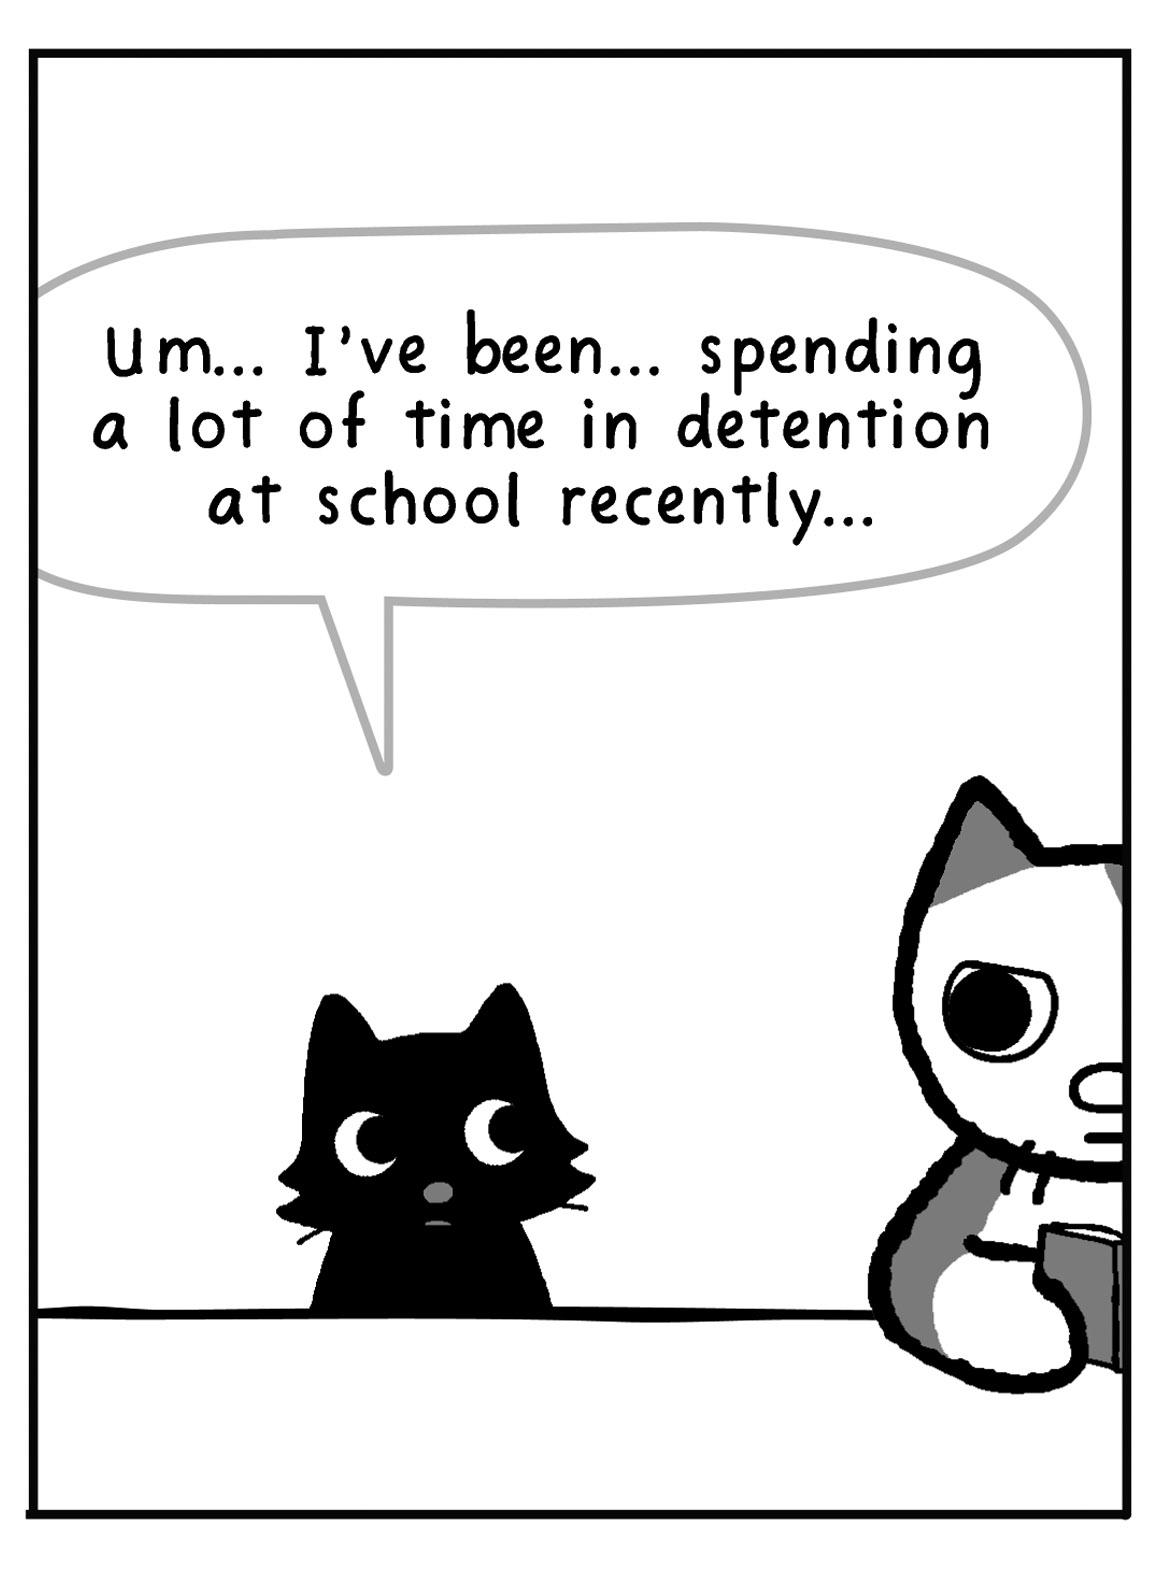 20130607_school and prisons_02-02.jpg